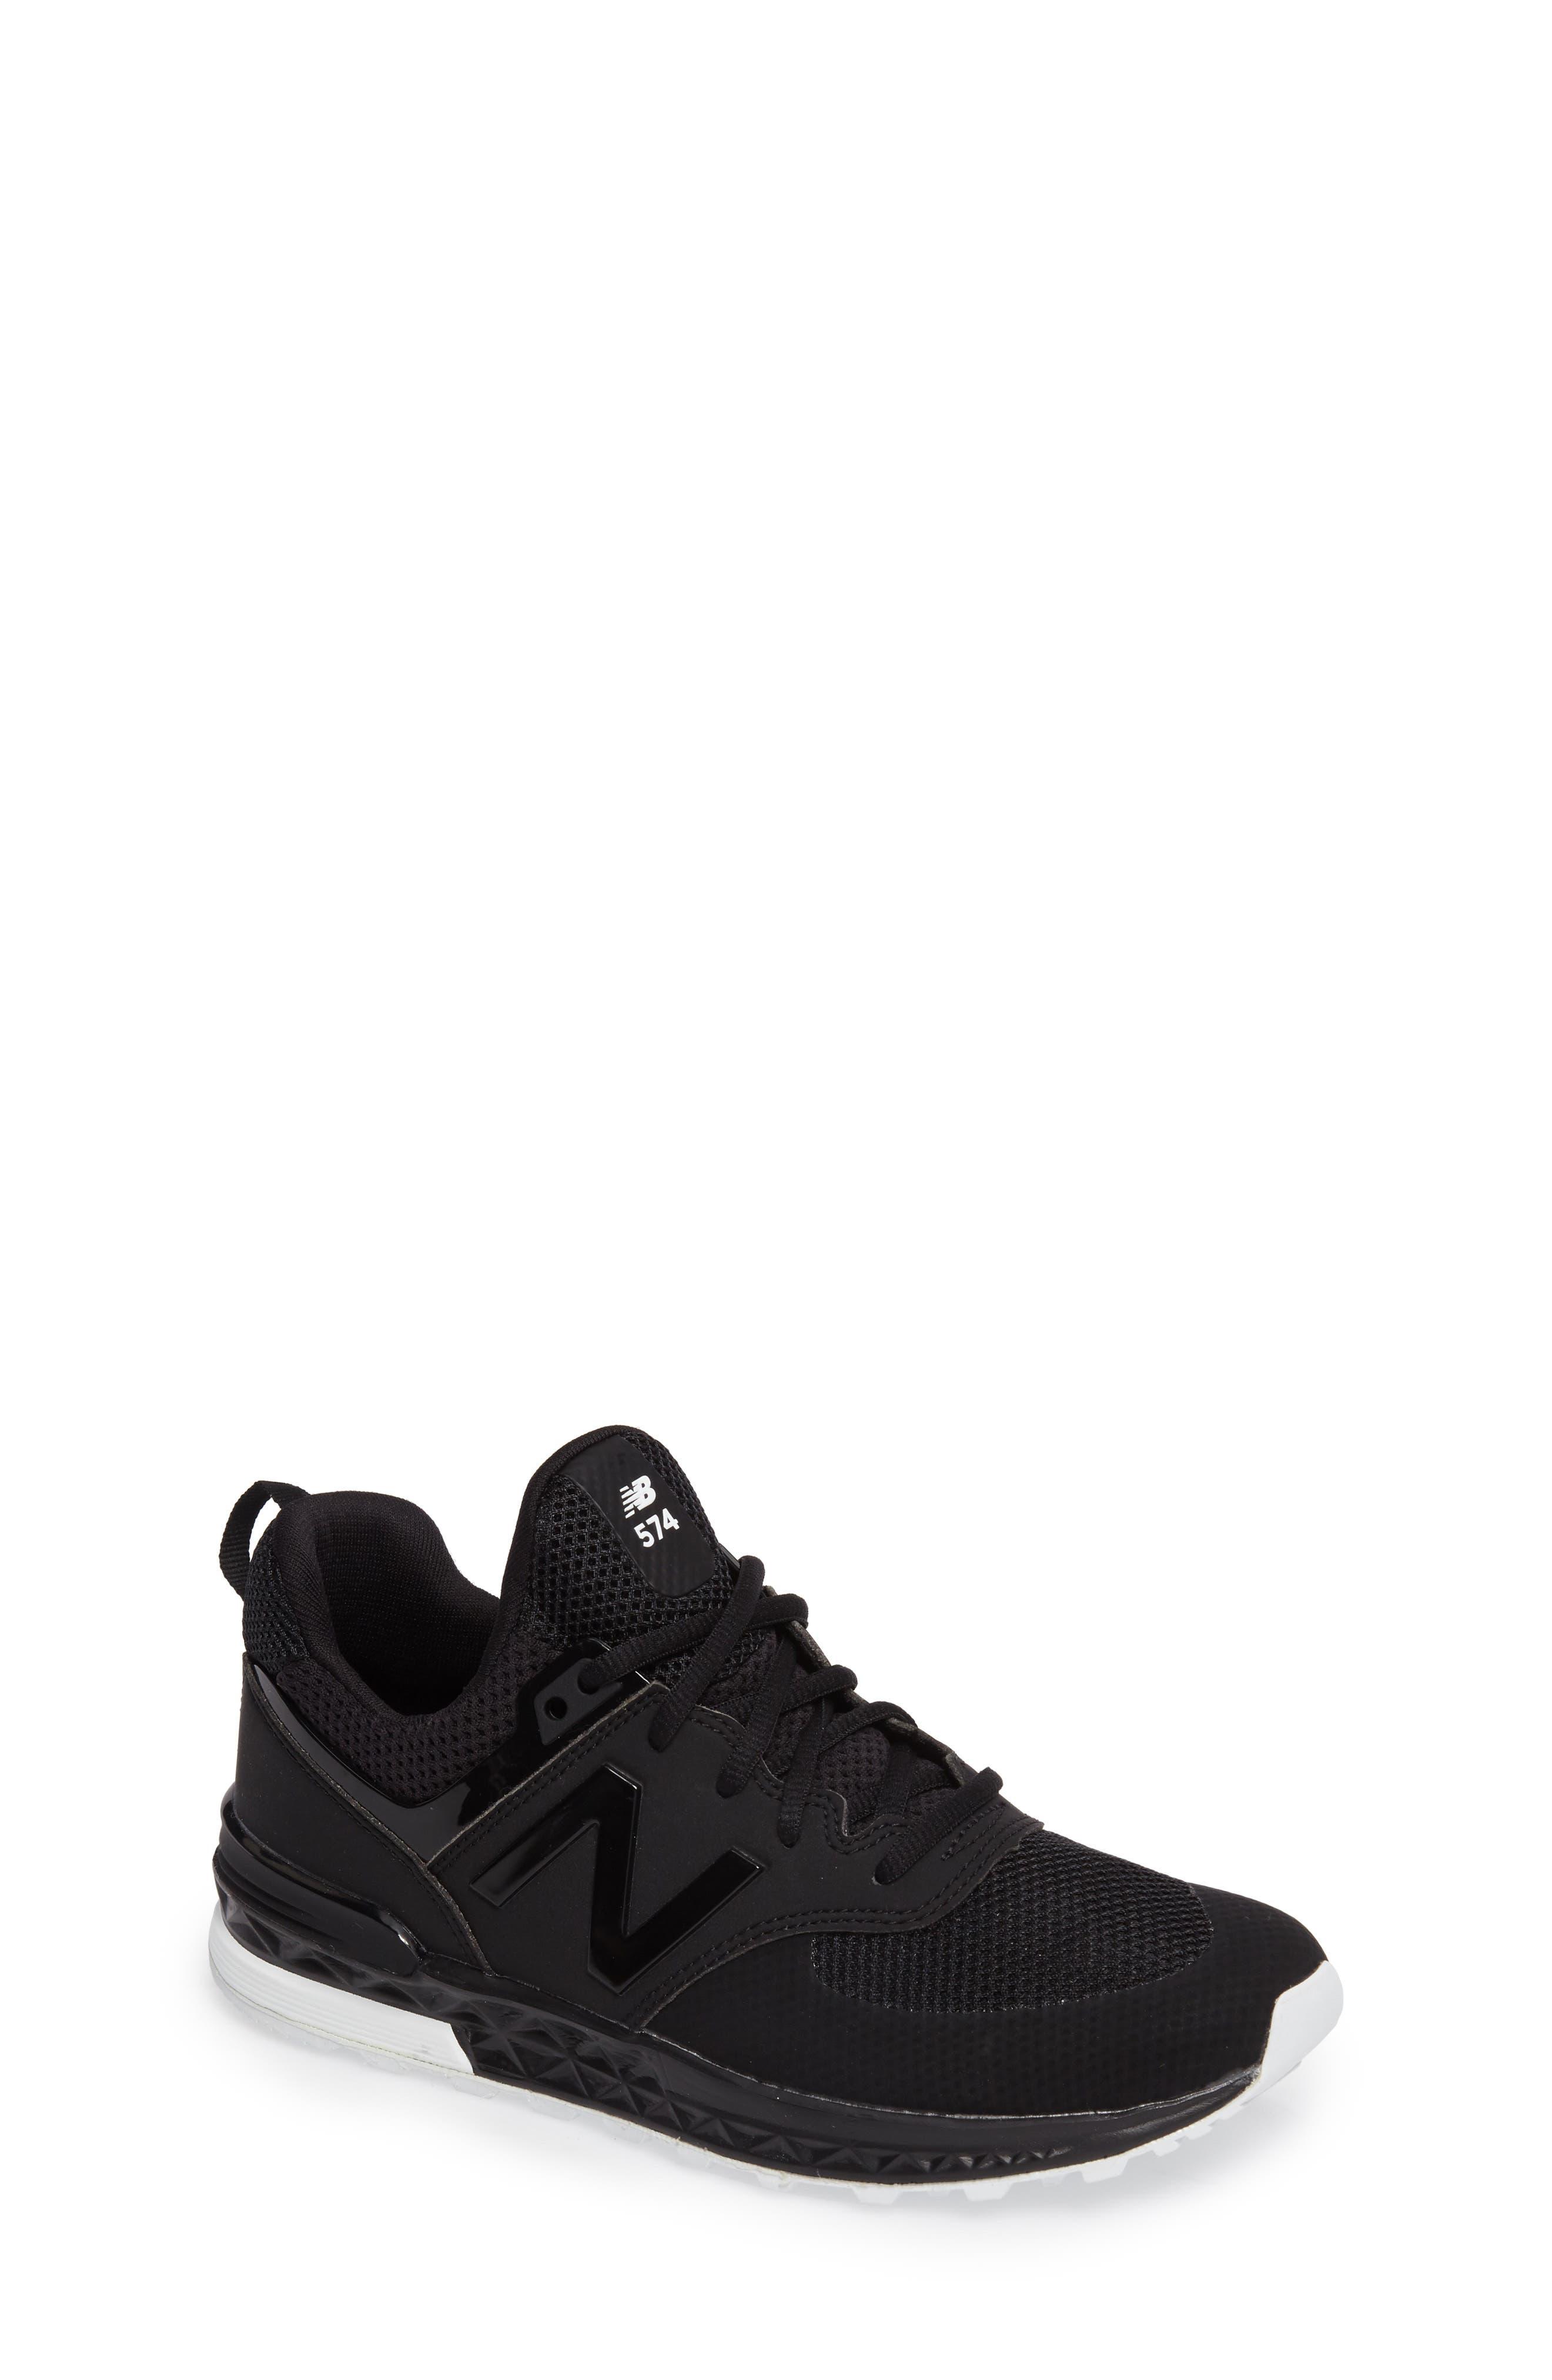 574 Sport Sneaker,                             Main thumbnail 1, color,                             Black